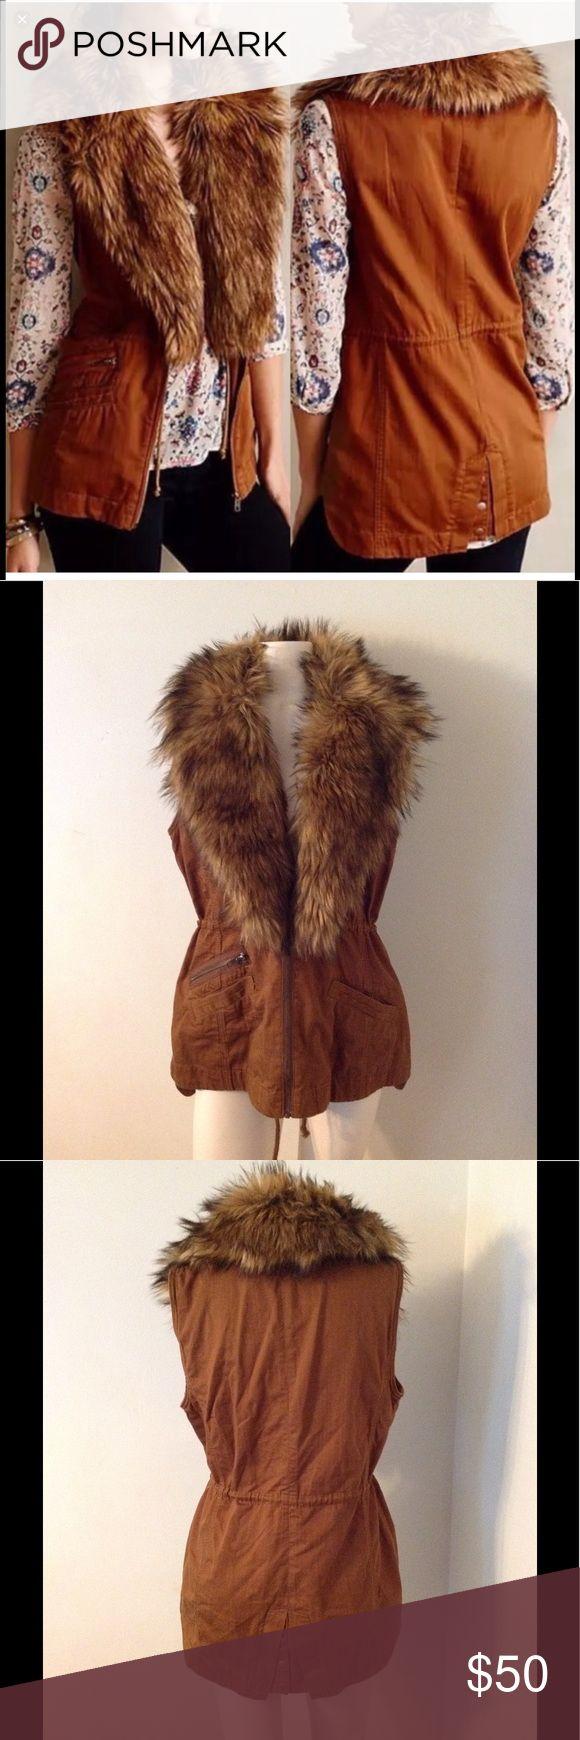 Anthro Hei Hei Faux Fur Vest M Beautiful Hei Hei vest from Anthropologie. Faux Fur is detachable. Great condition Anthropologie Jackets & Coats Vests